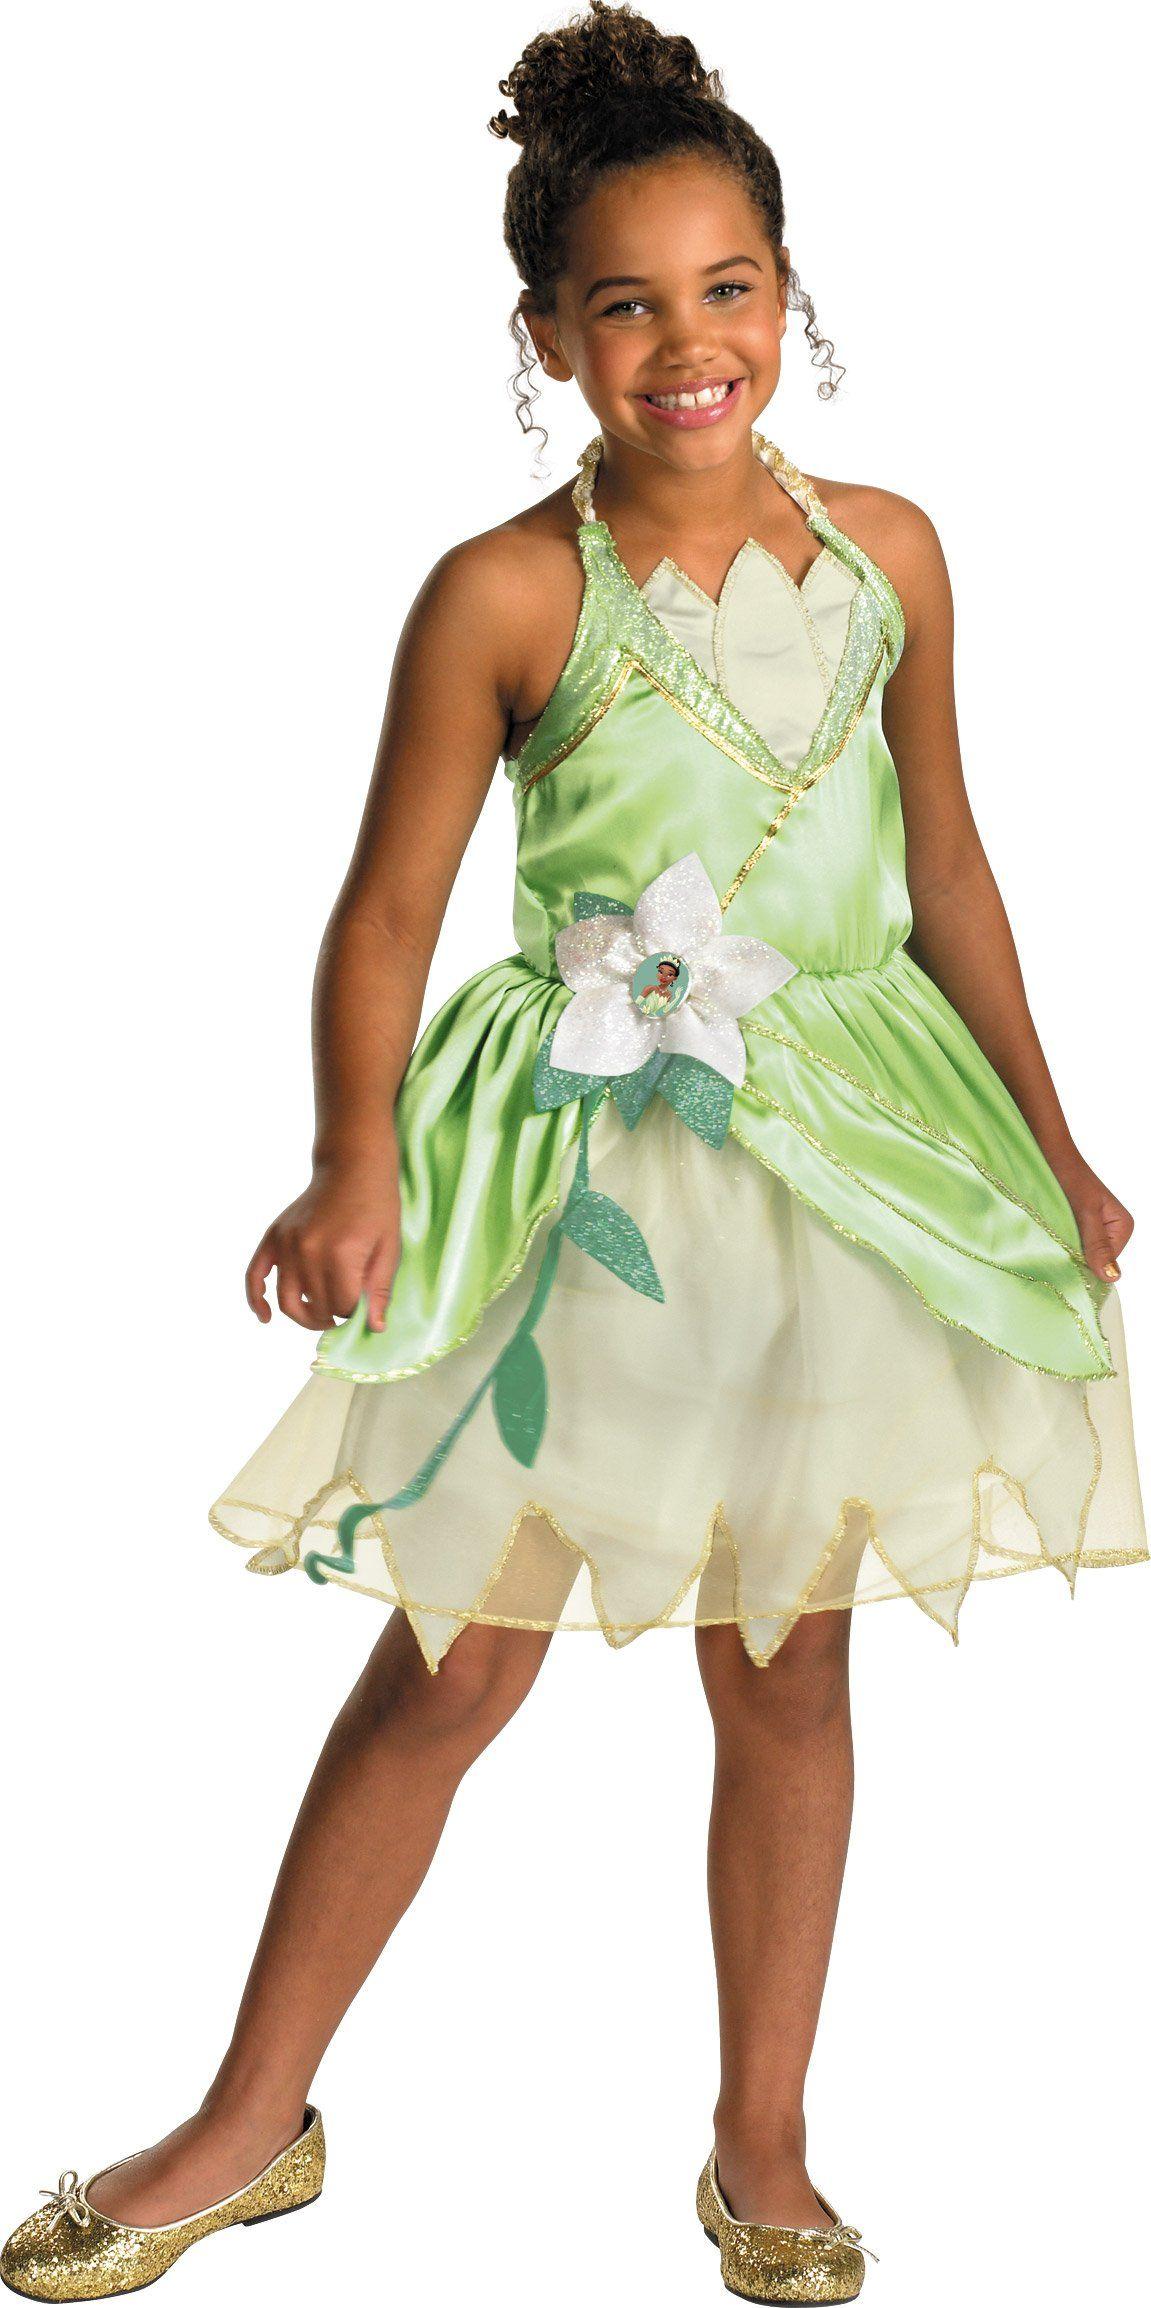 Disney Tiana Deluxe Sparkle Toddler Child Costume